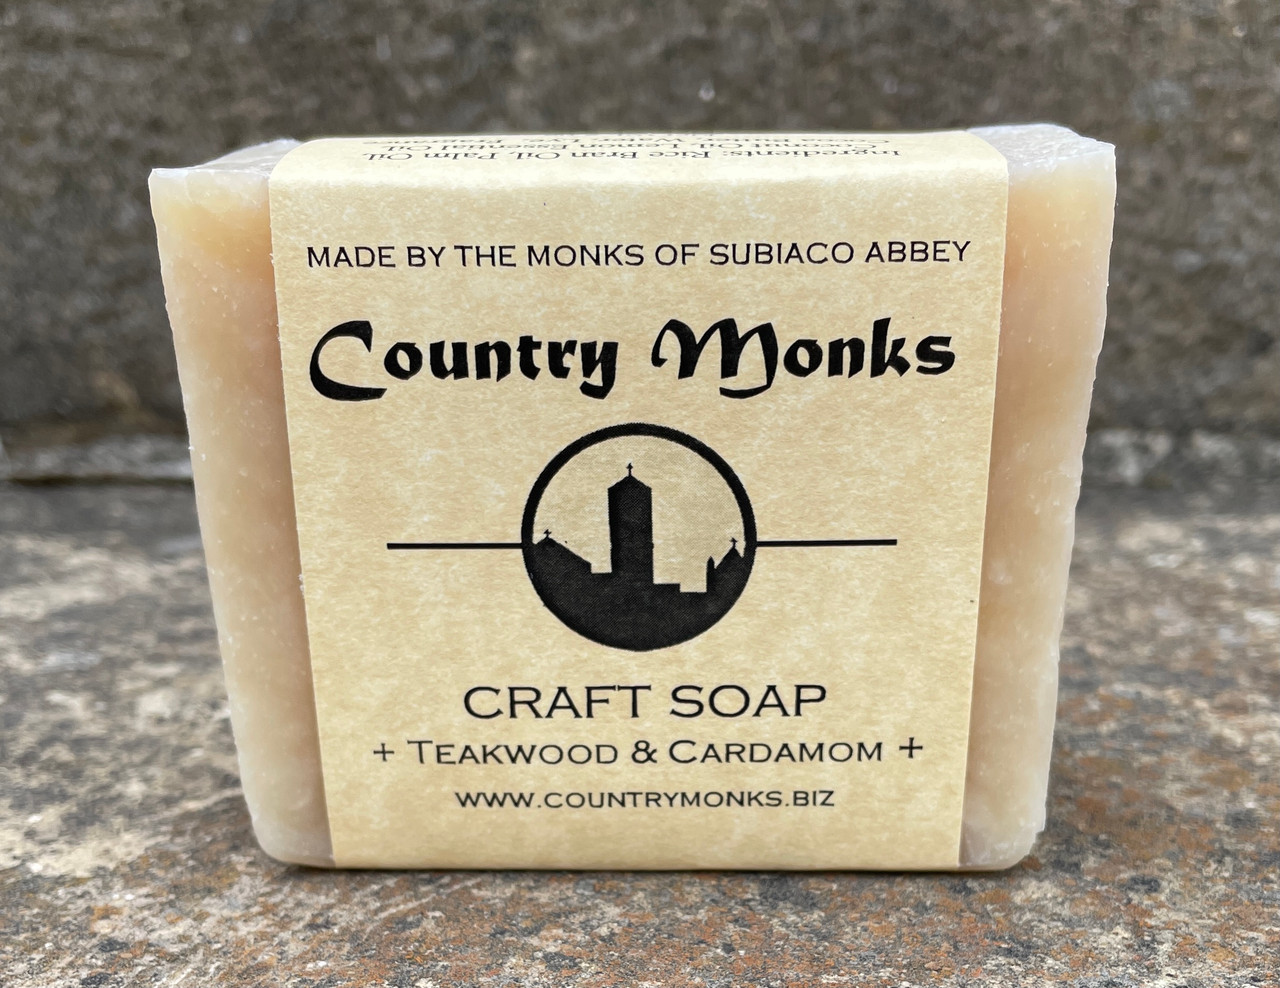 Soaps (Teakwood & Cardamom)